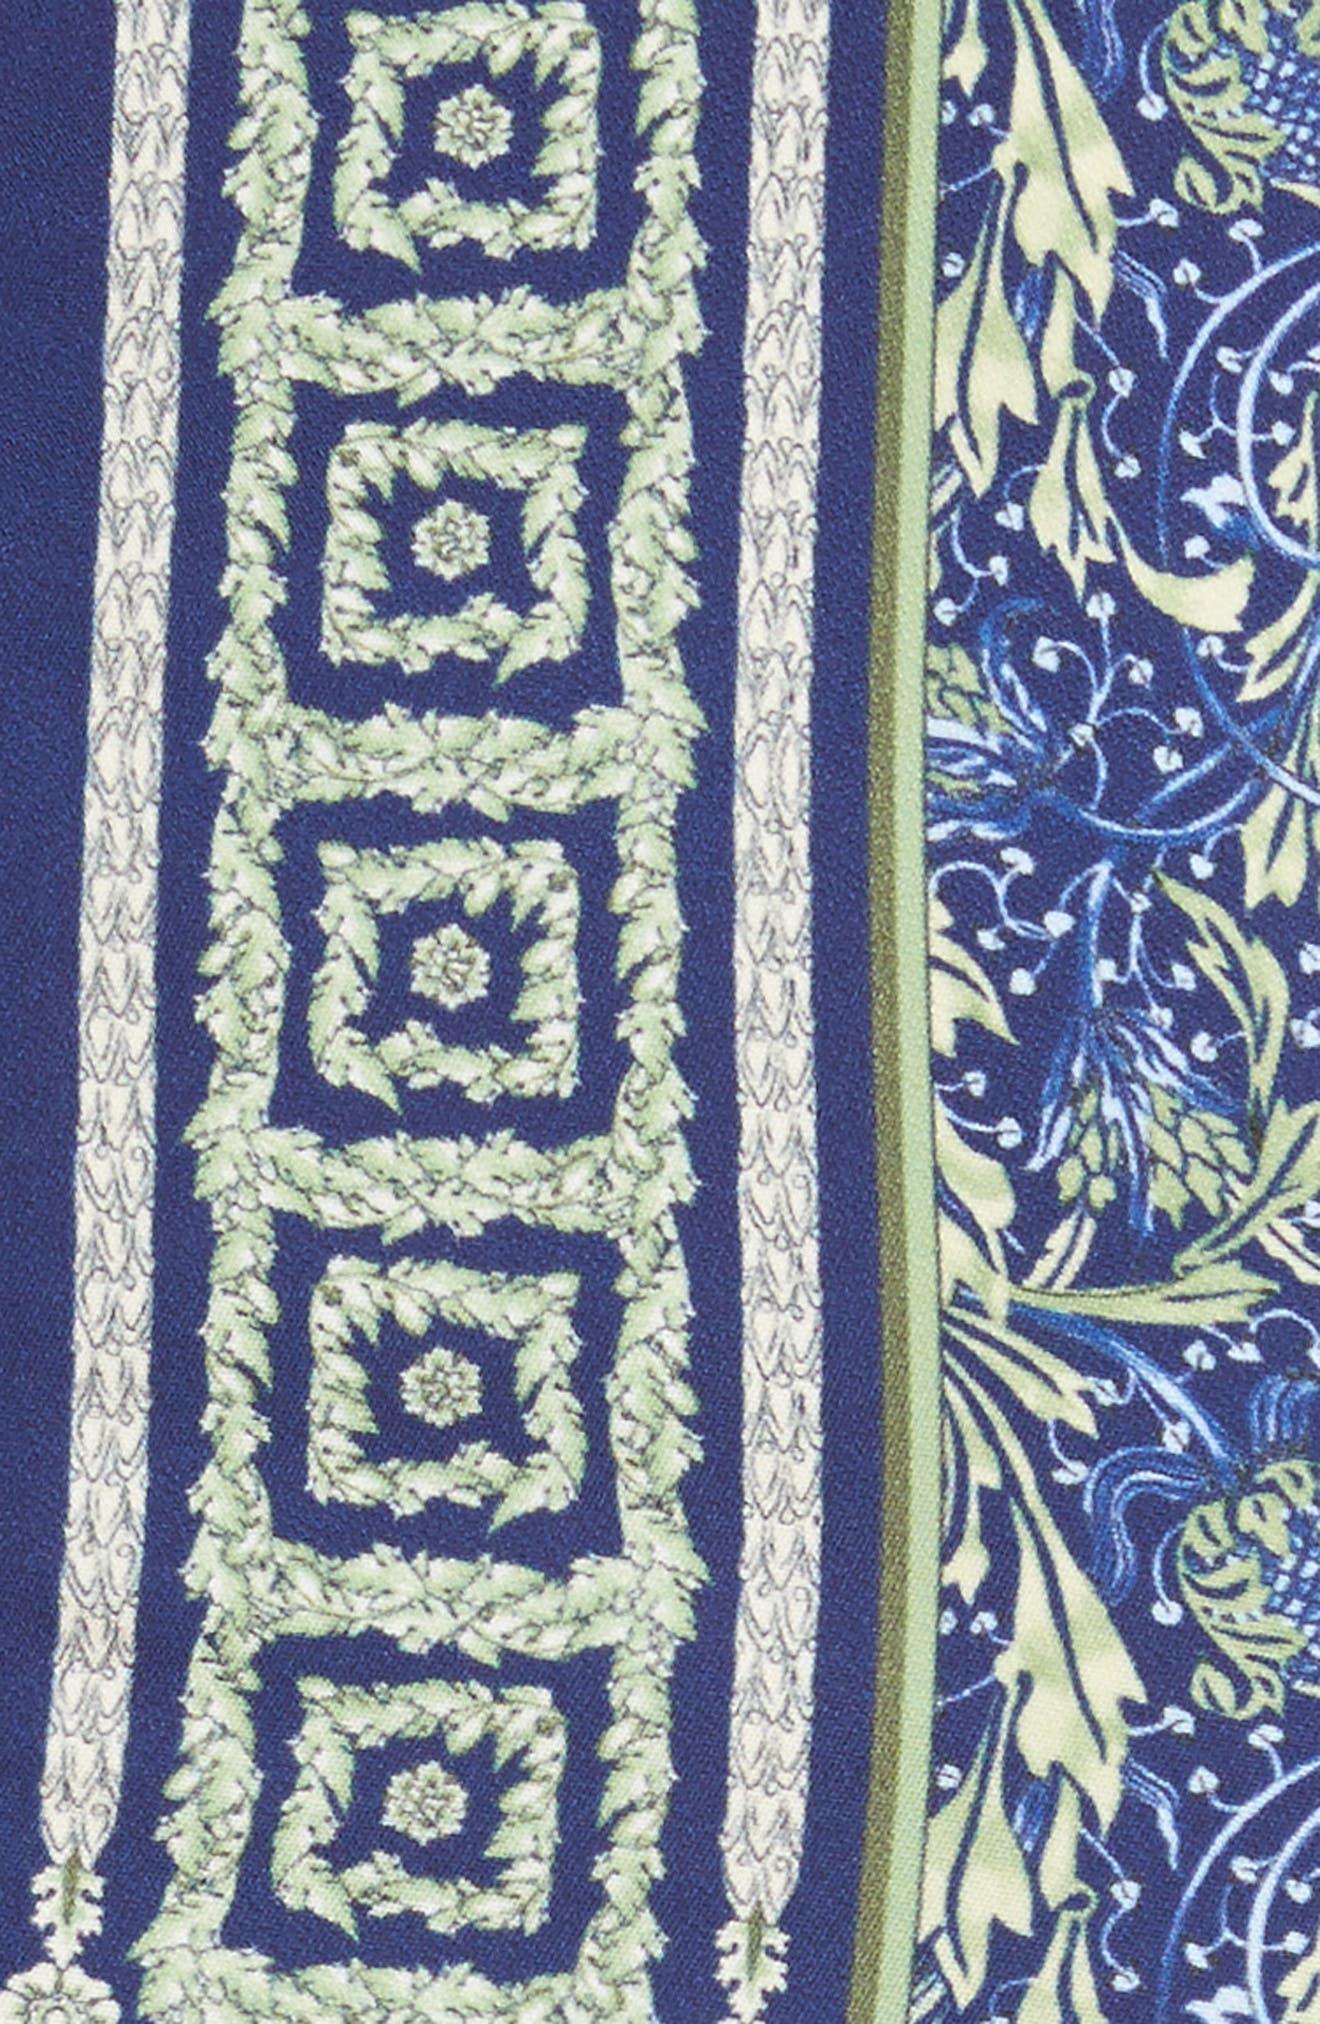 Acanthus Print Sheath Dress,                             Alternate thumbnail 4, color,                             Electric Blue Print